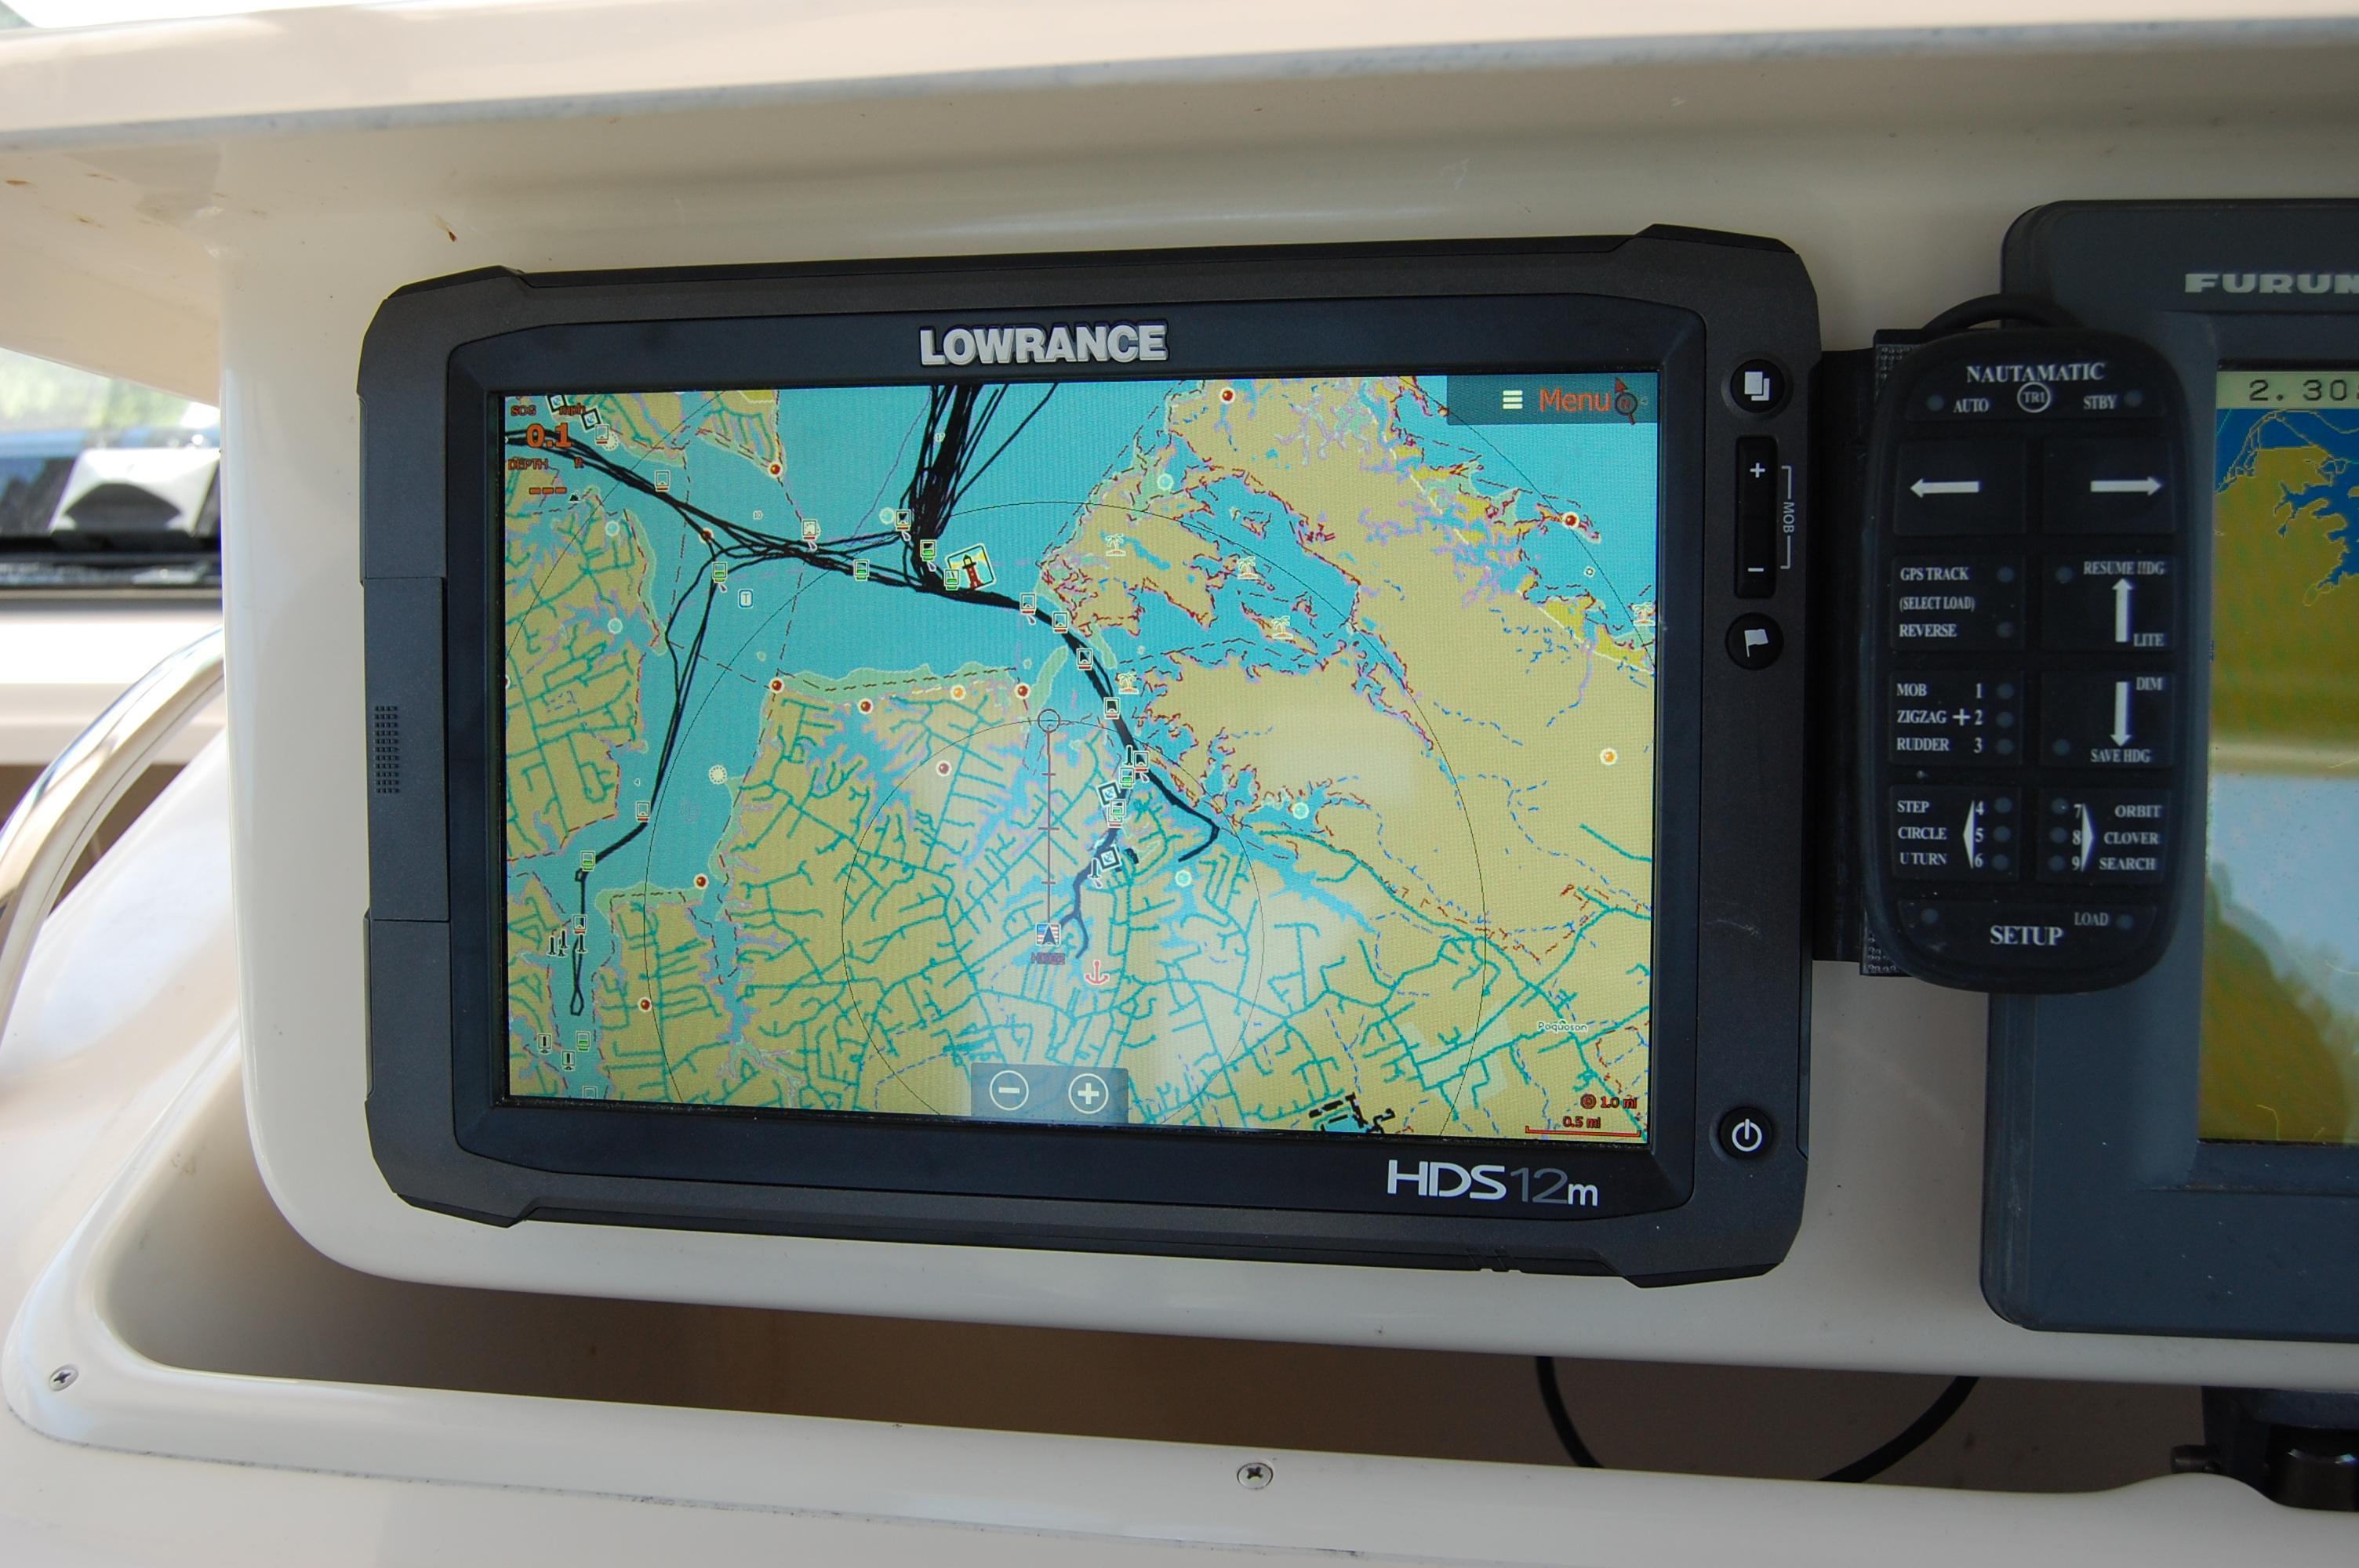 2002 Grady White 330 Express, Lowrance HDS plotter